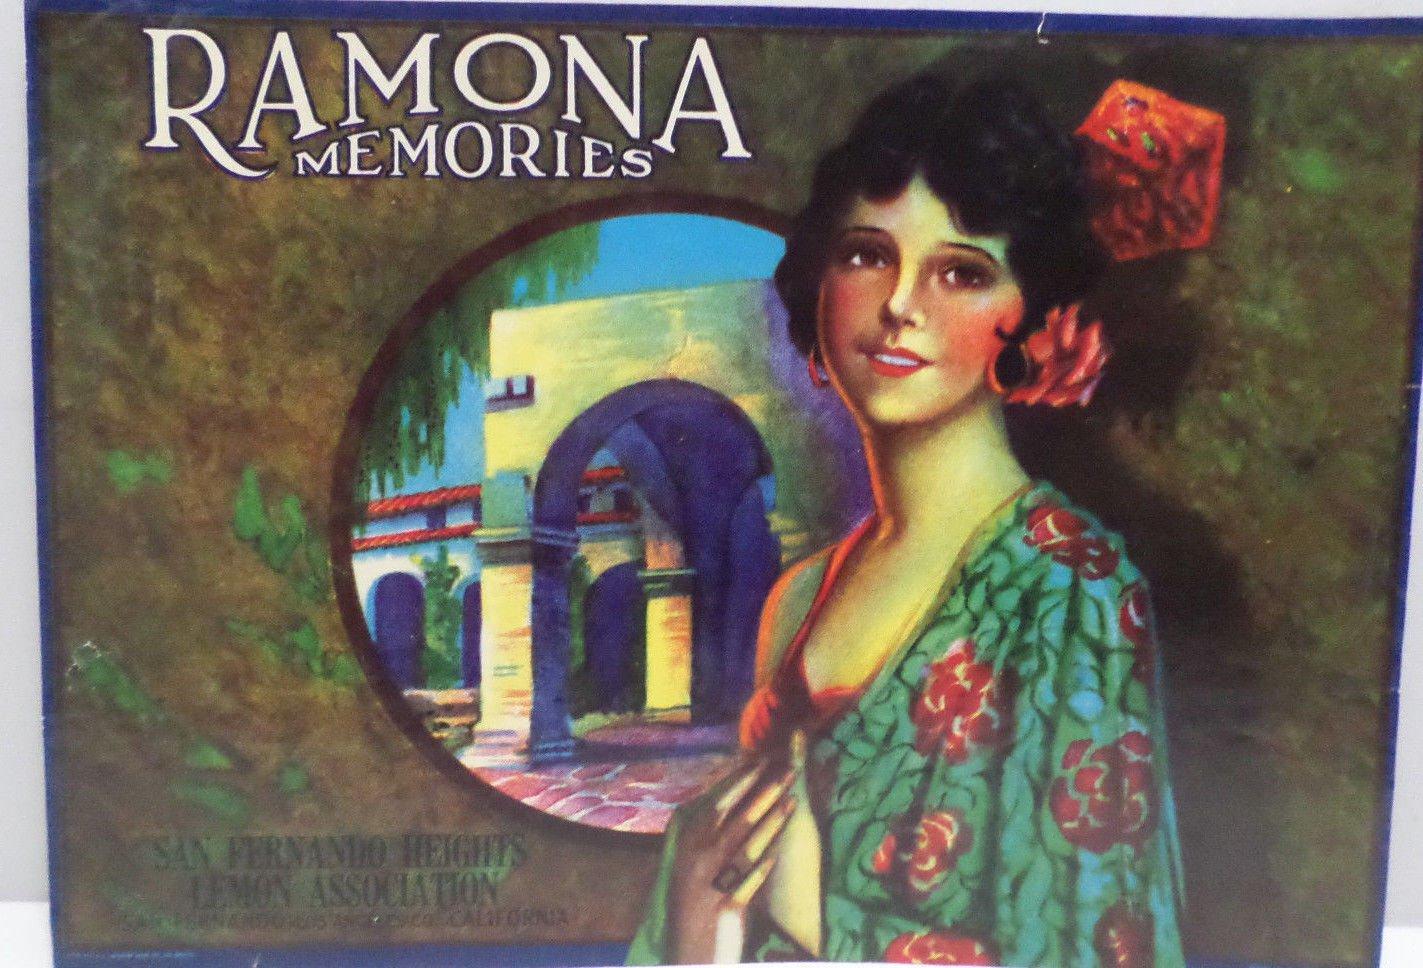 Vintage Crate Label Ramona Memories San Fernando Heights Lemon Assoc. Original